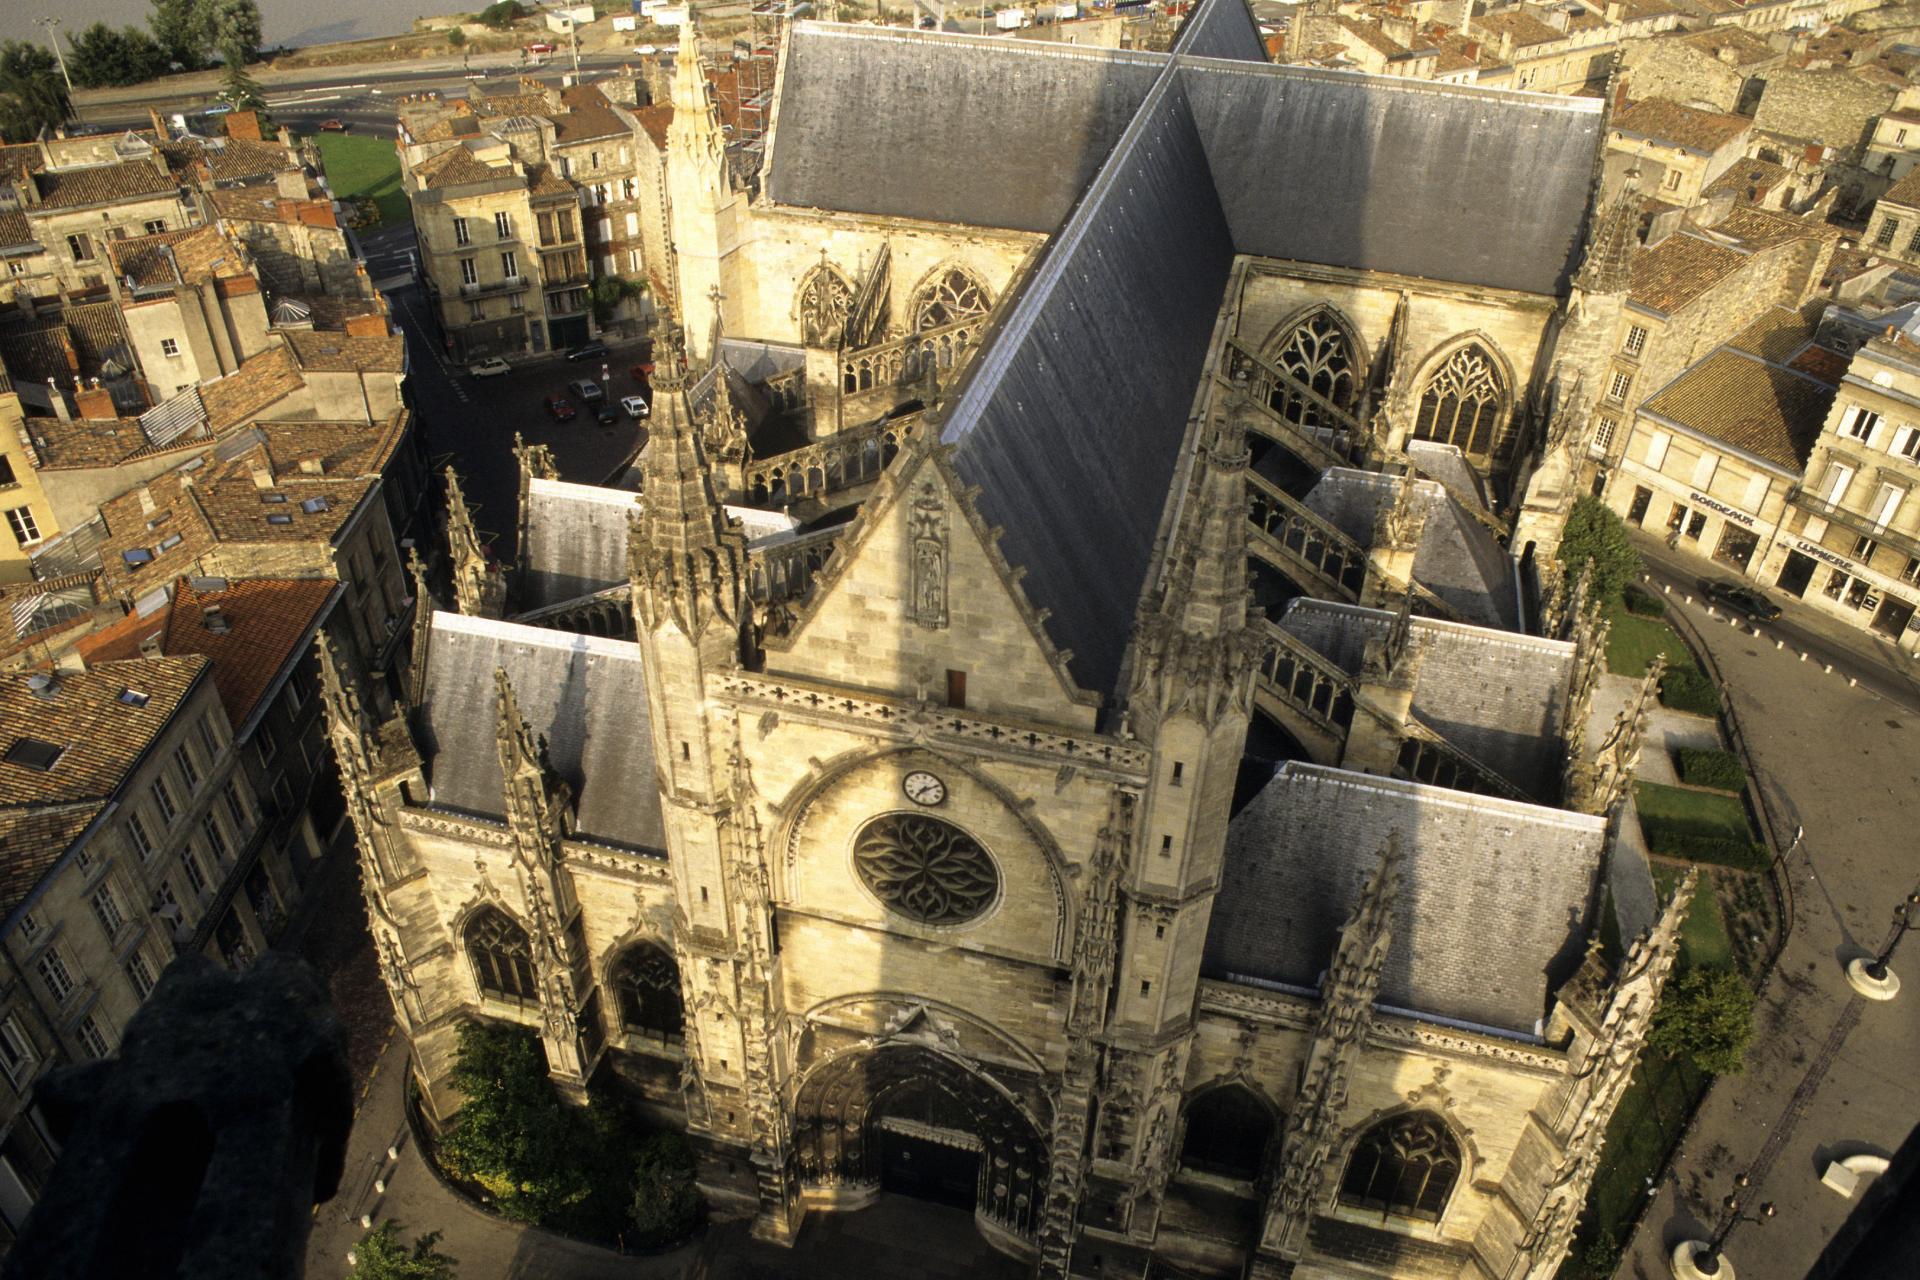 Vista aérea da Basílica Saint-Michel